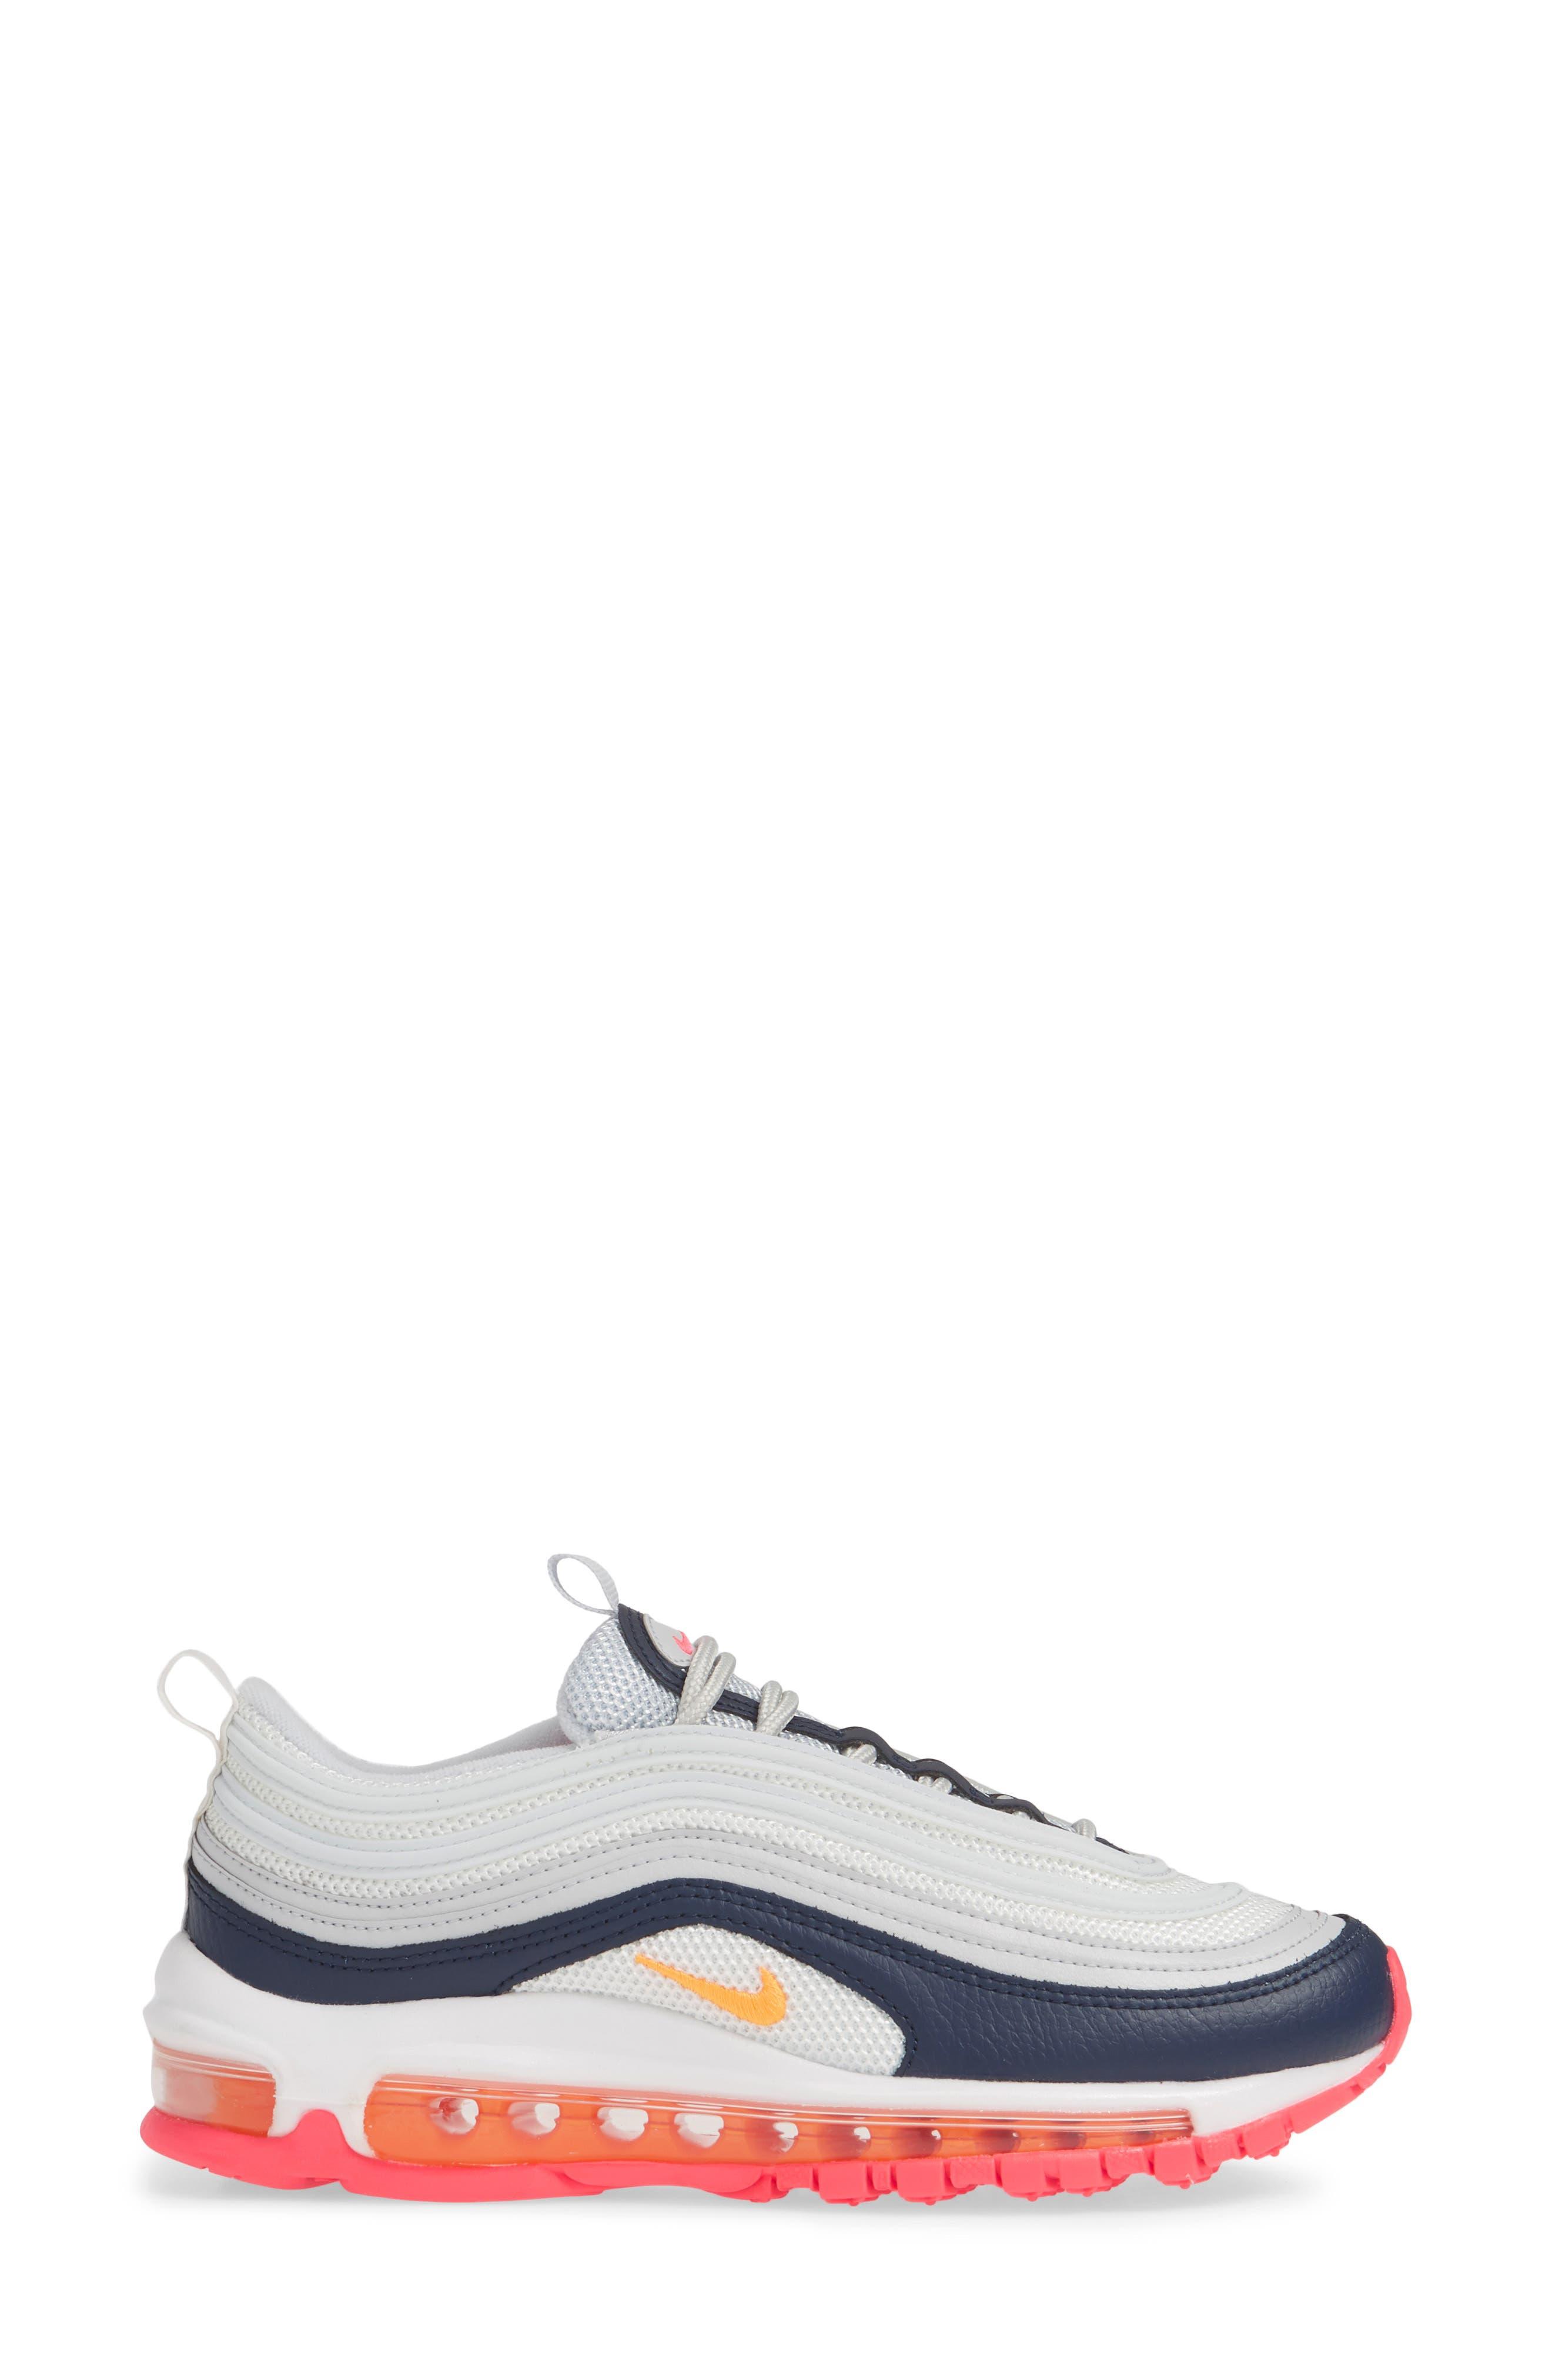 NIKE, Air Max 97 Sneaker, Alternate thumbnail 3, color, PLATINUM/ LASER ORANGE/ NAVY